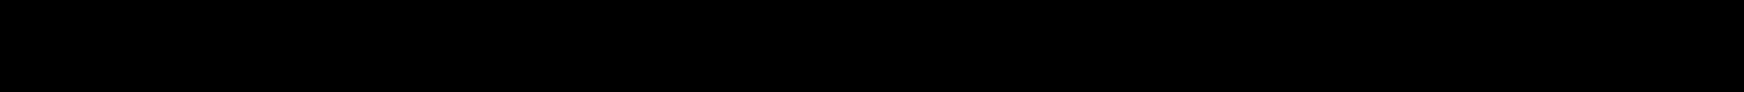 MetaPro-CondMedi.otf